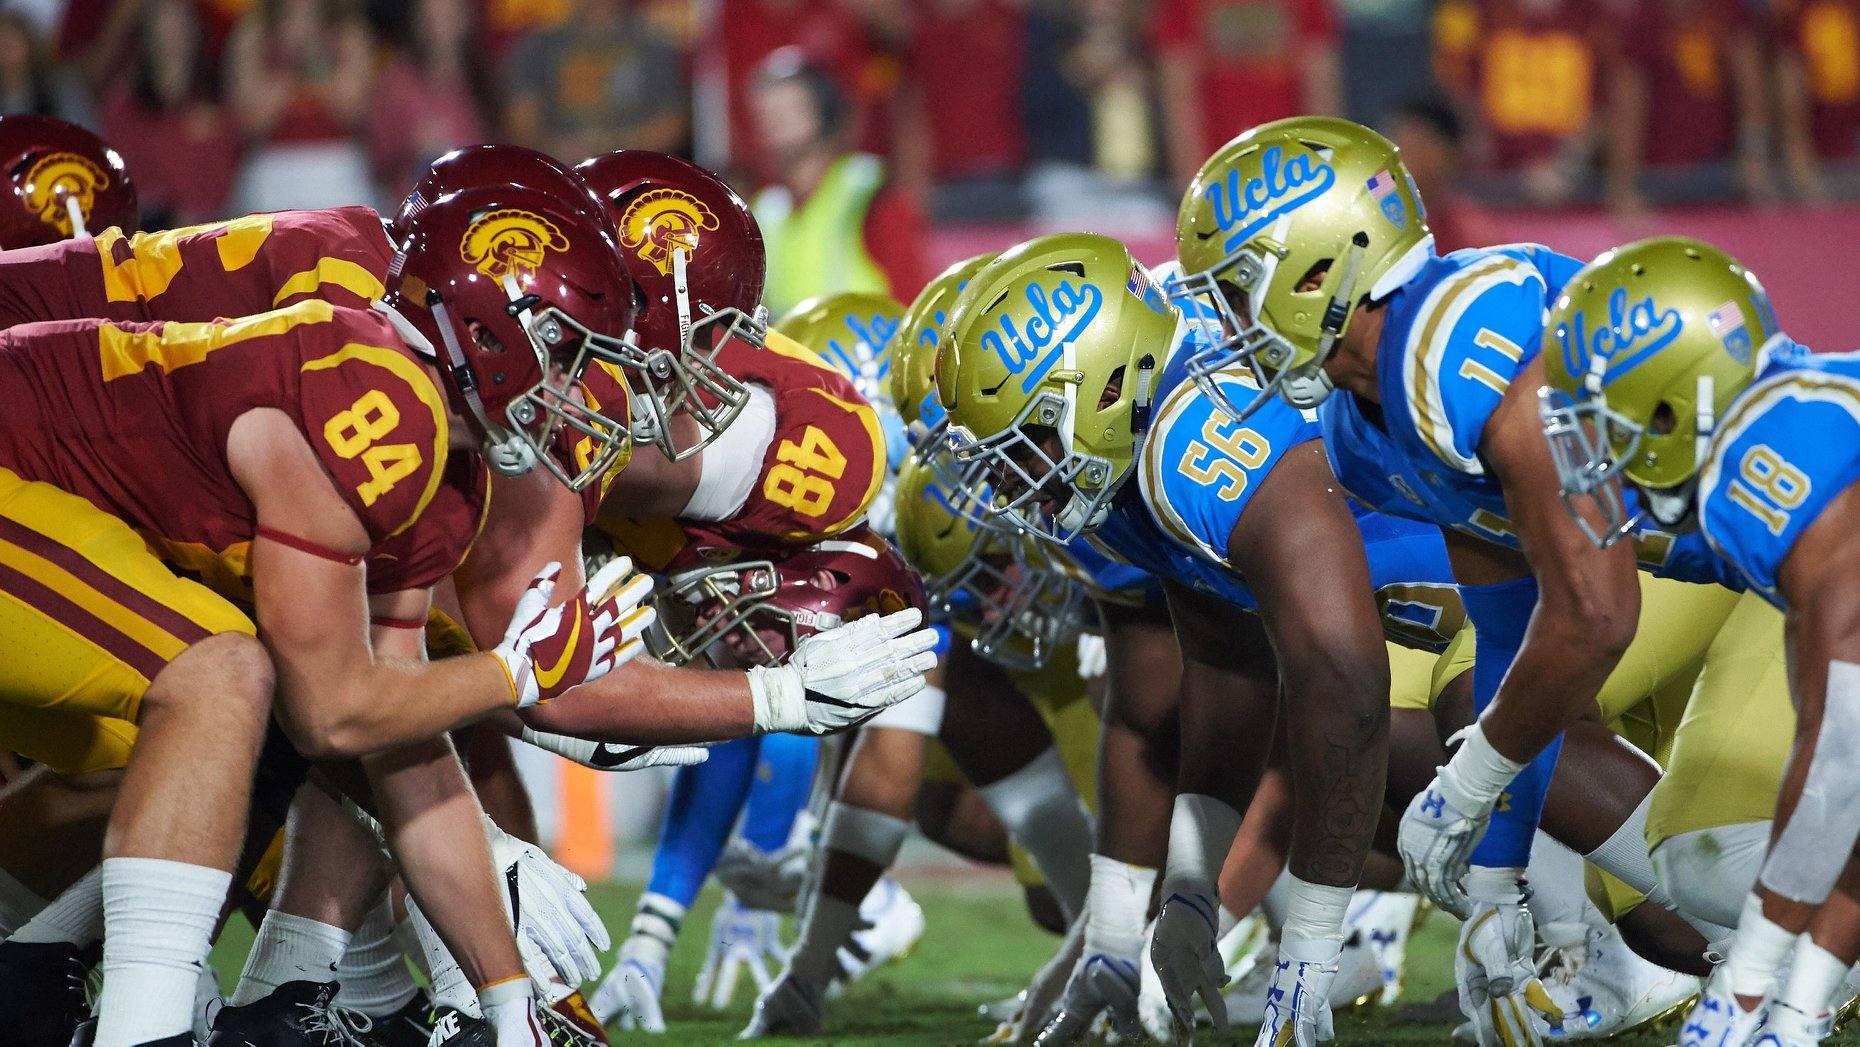 UCLA vs USC football game